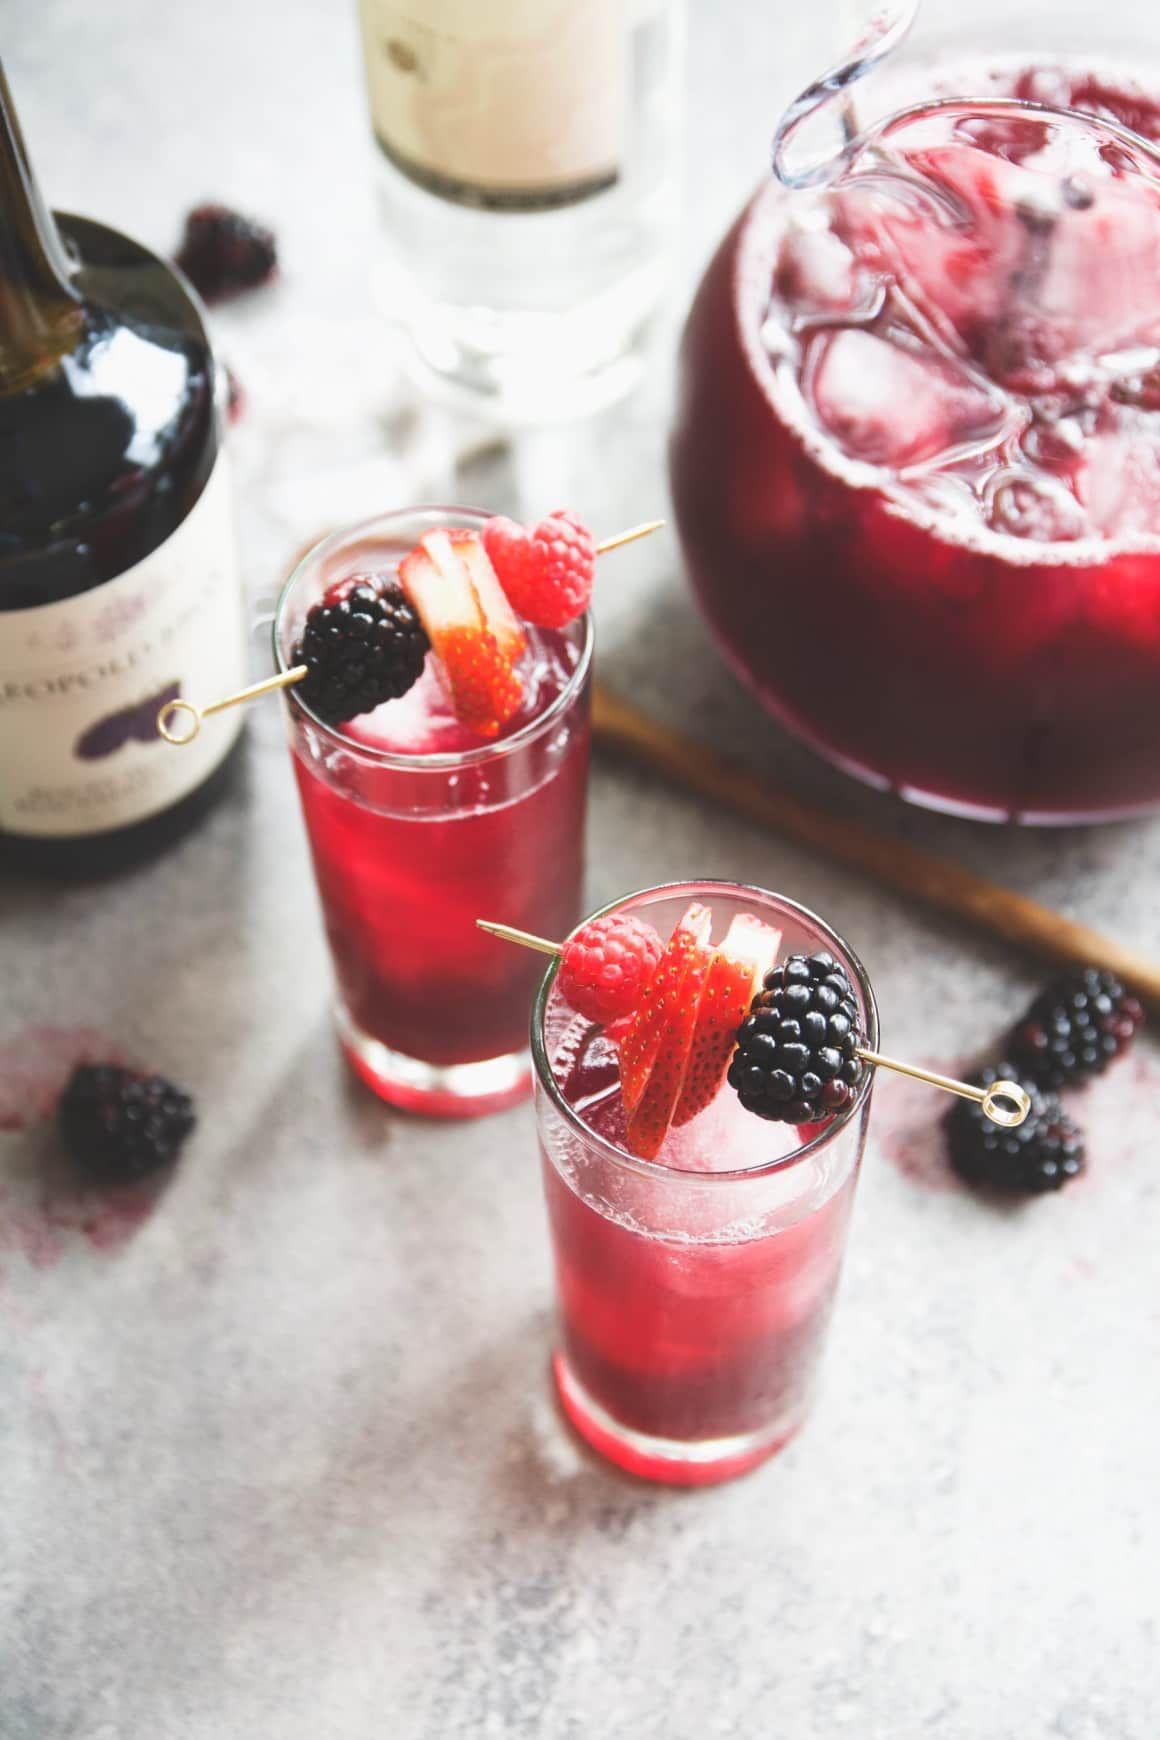 Red Wine Blackberry Ginger Pitcher Cocktail Recipe With Images Ginger Cocktails Pitcher Cocktails Batch Cocktails